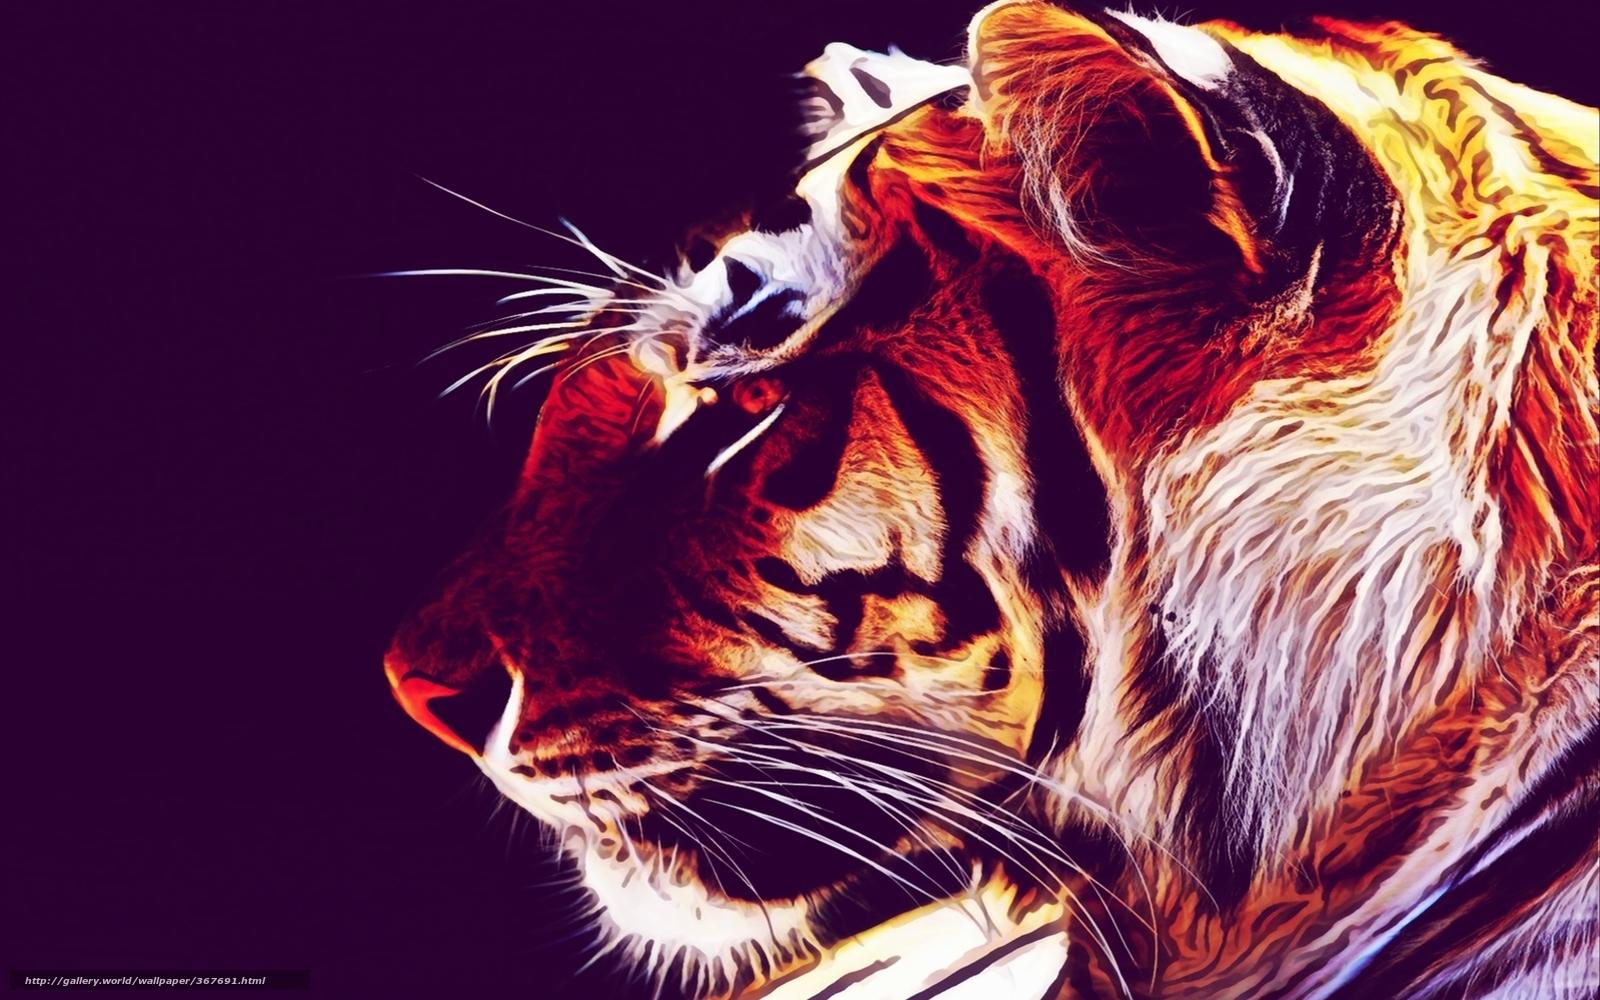 Tlcharger fond d 39 ecran tigre papier peint fond style for Fond ecran style